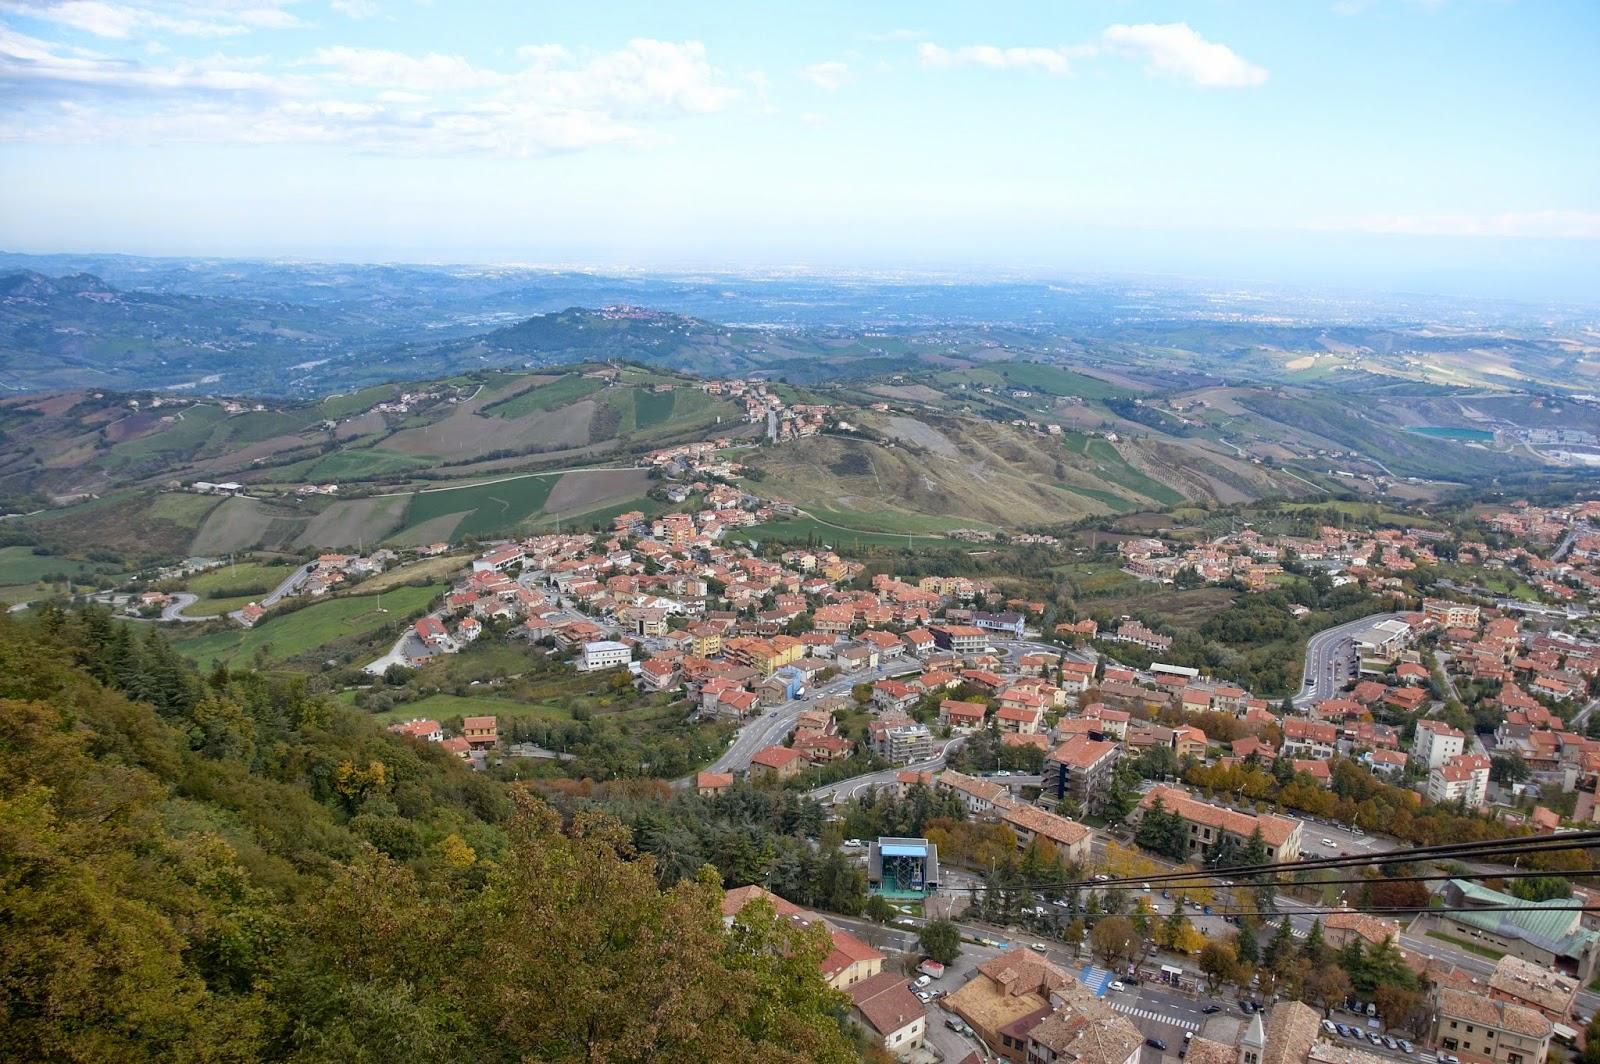 widok na okolice republiki San Marino